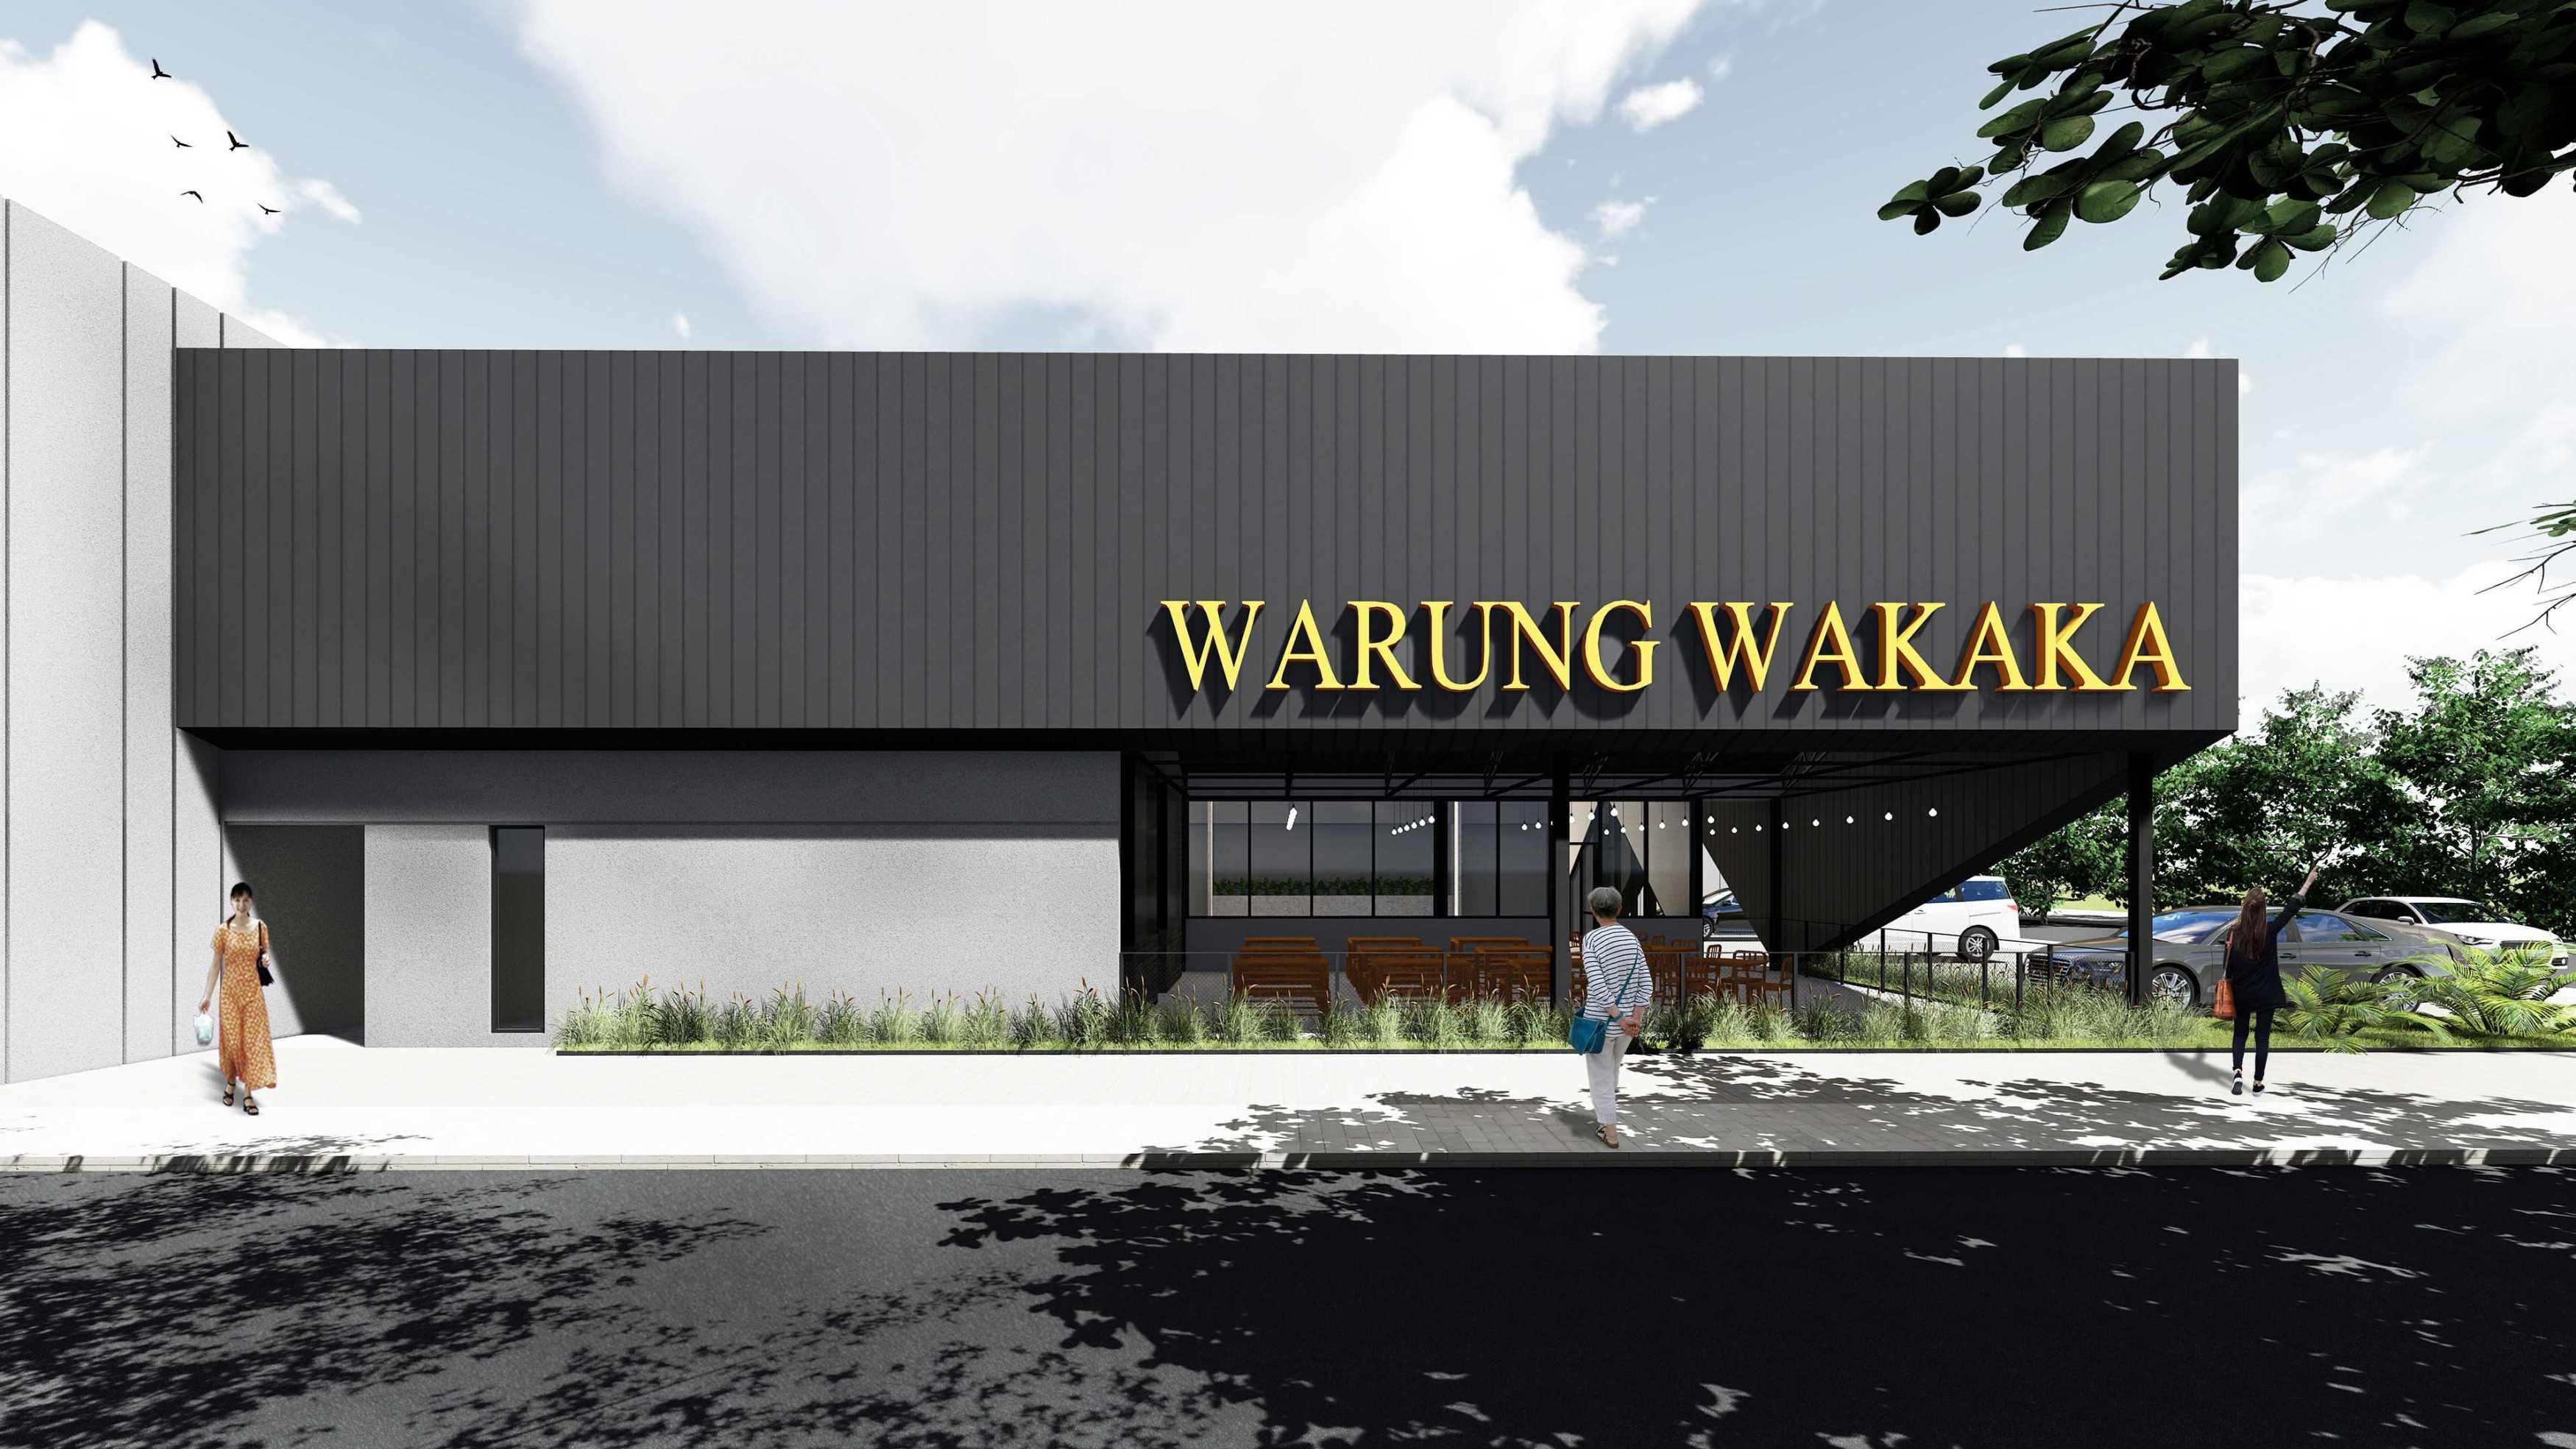 Co Associates Warung Wakaka Samarinda Kota Samarinda, Kalimantan Timur, Indonesia Kota Samarinda, Kalimantan Timur, Indonesia Co-Associates-Warung-Wakaka-Samarinda   72387